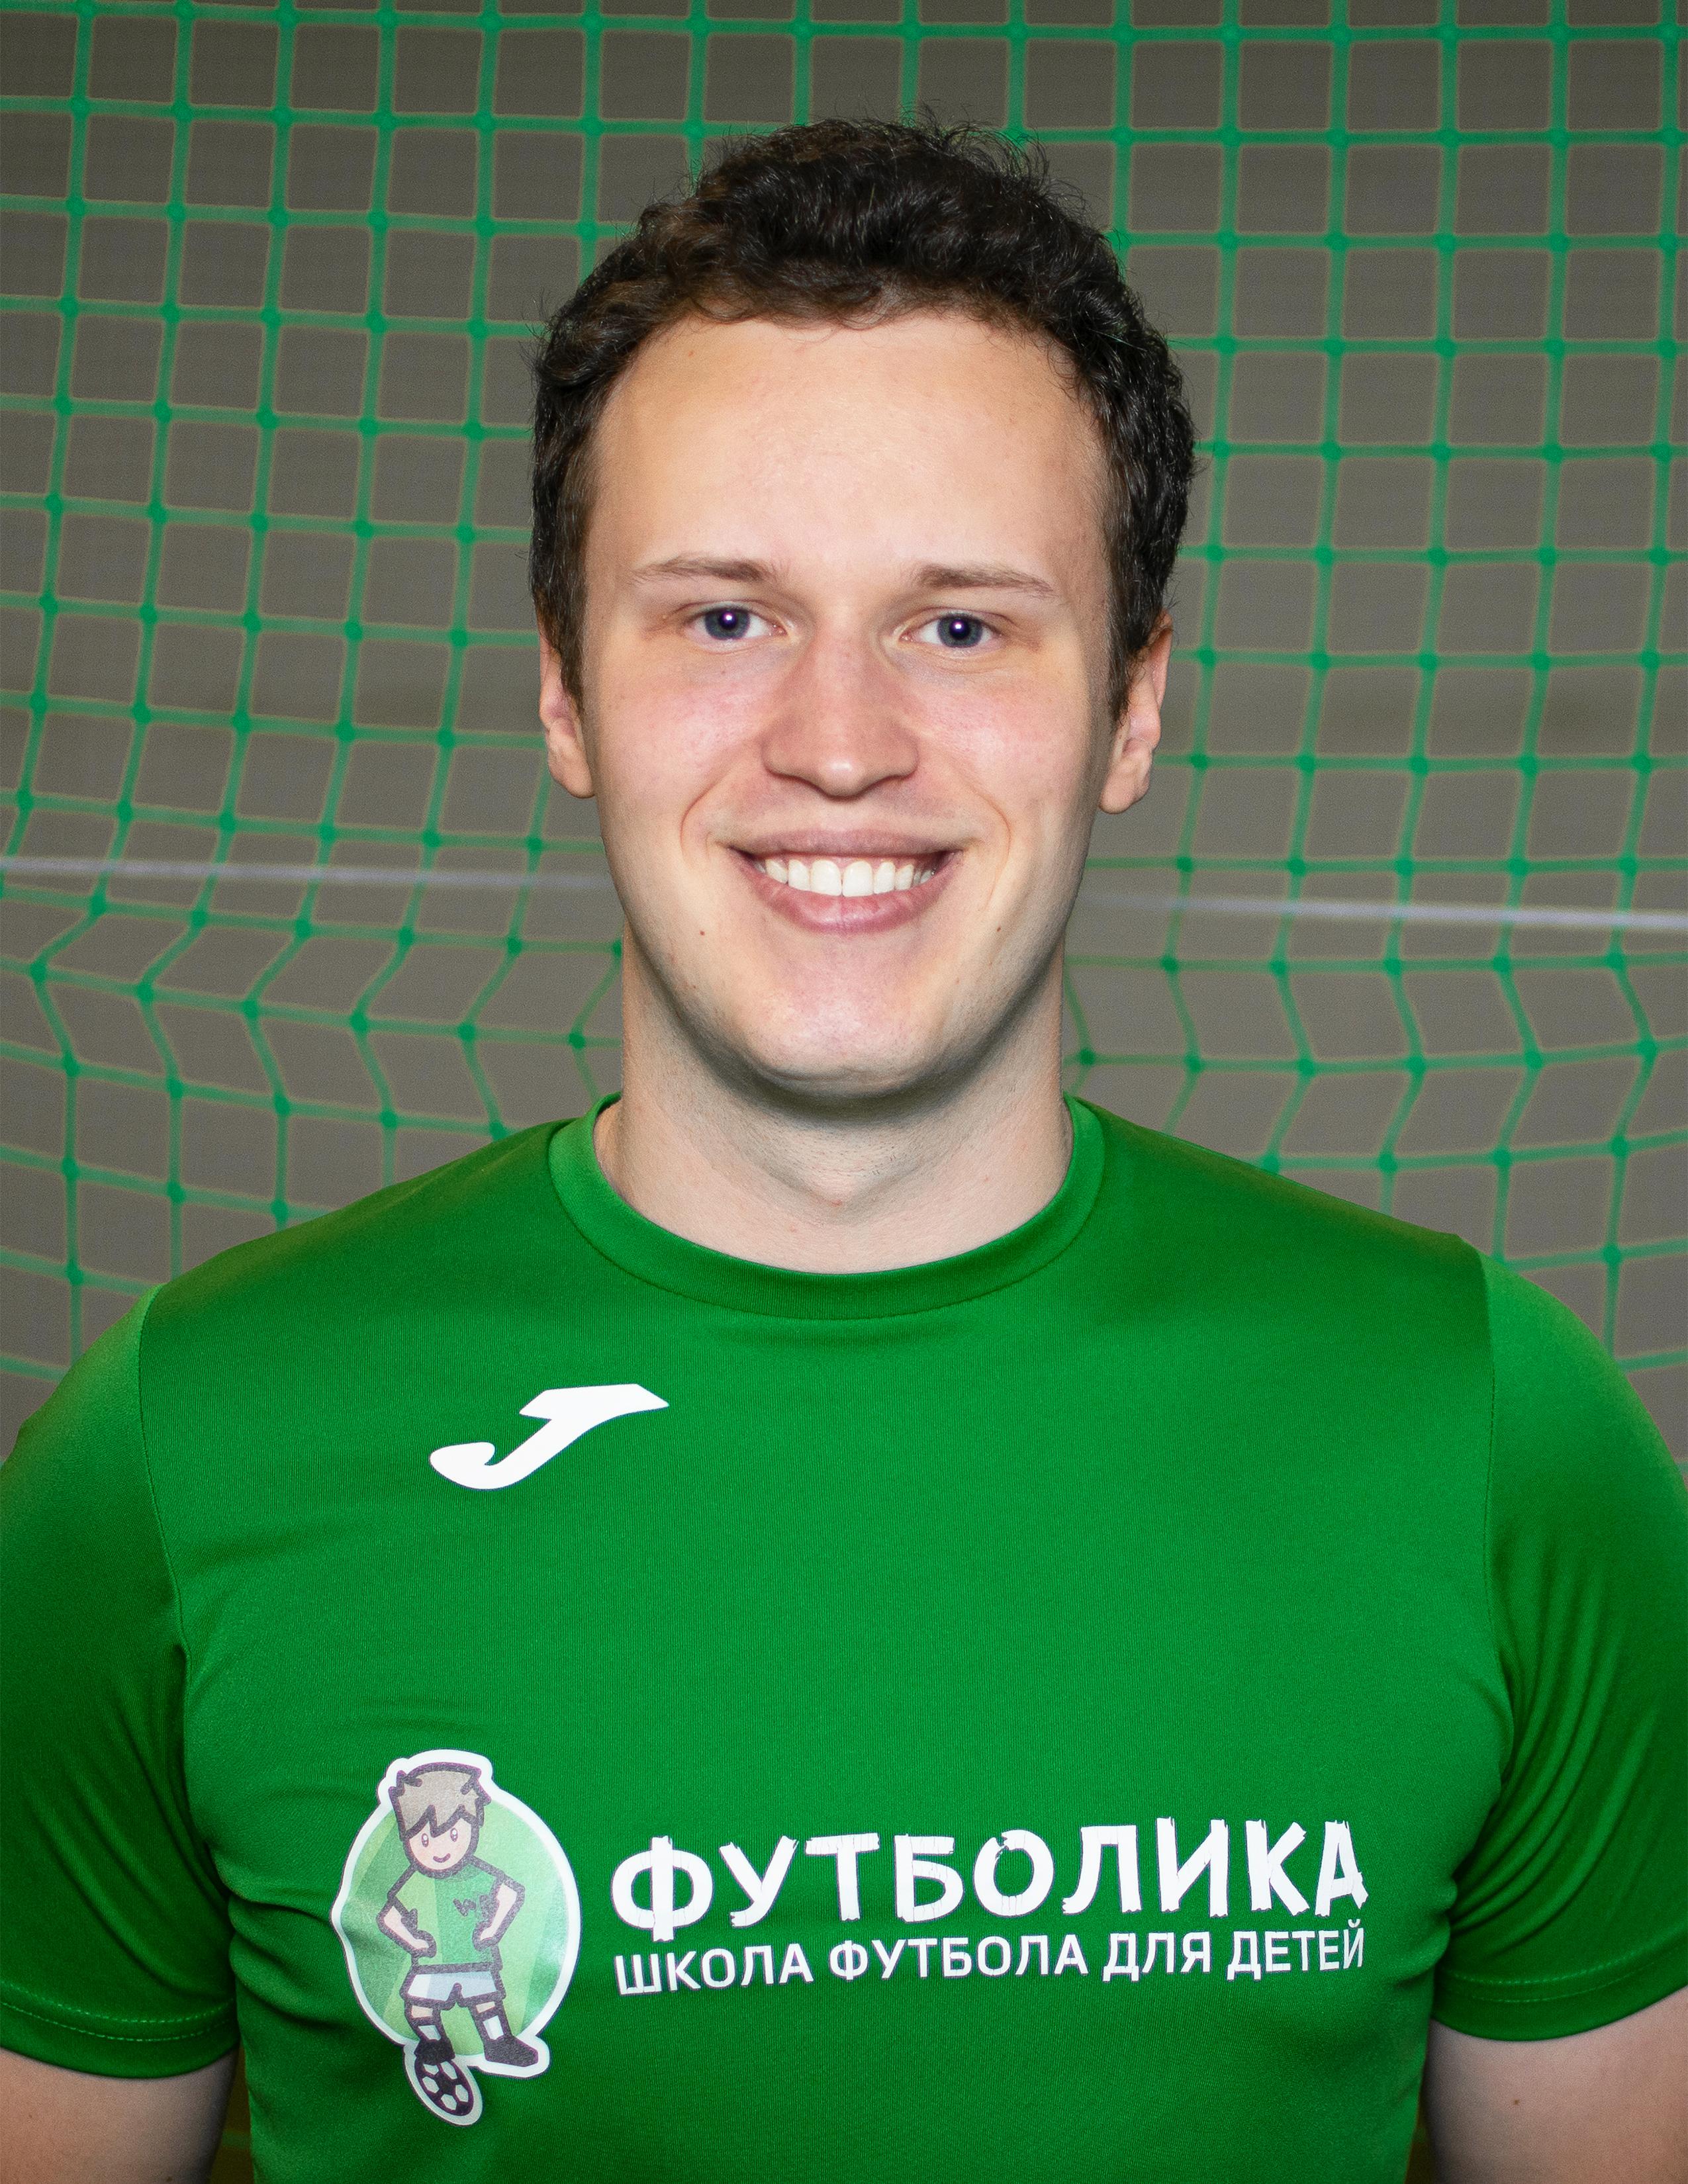 тренер футболики Ефтимицэ Максим